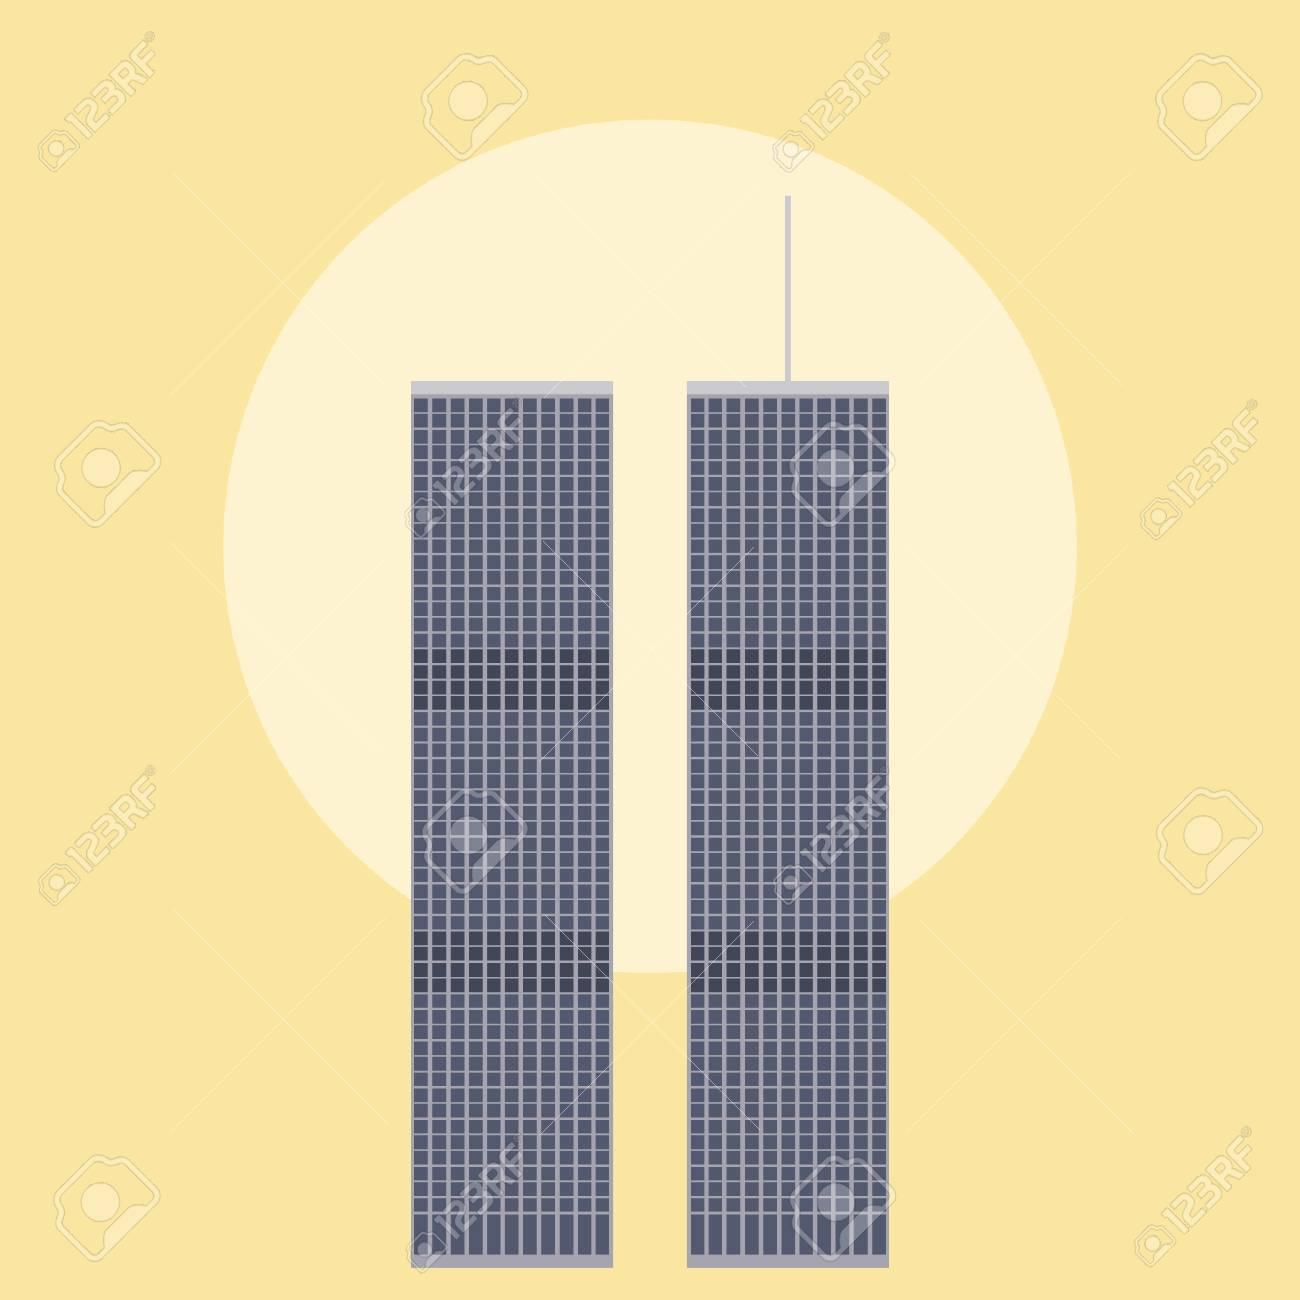 World Trade Center - United States - 110619518